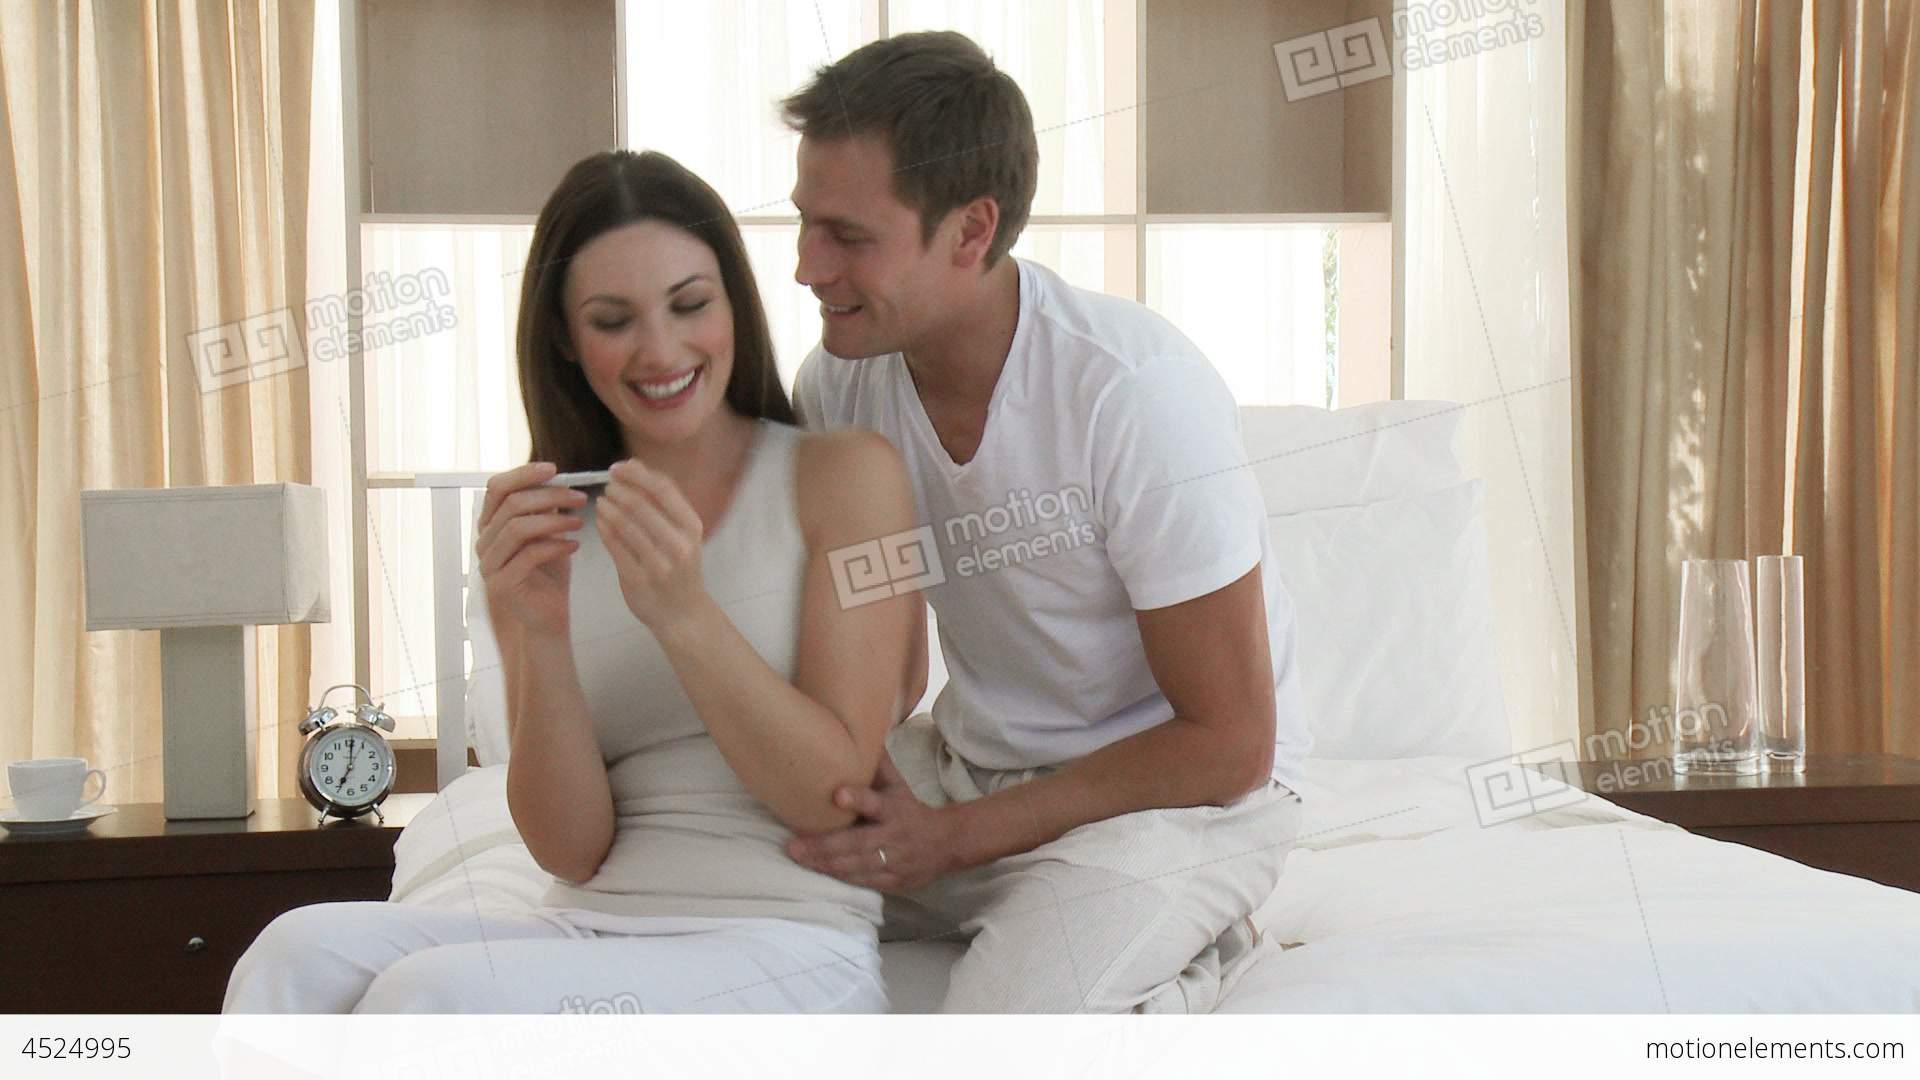 27 unexplainable dating site screencaps